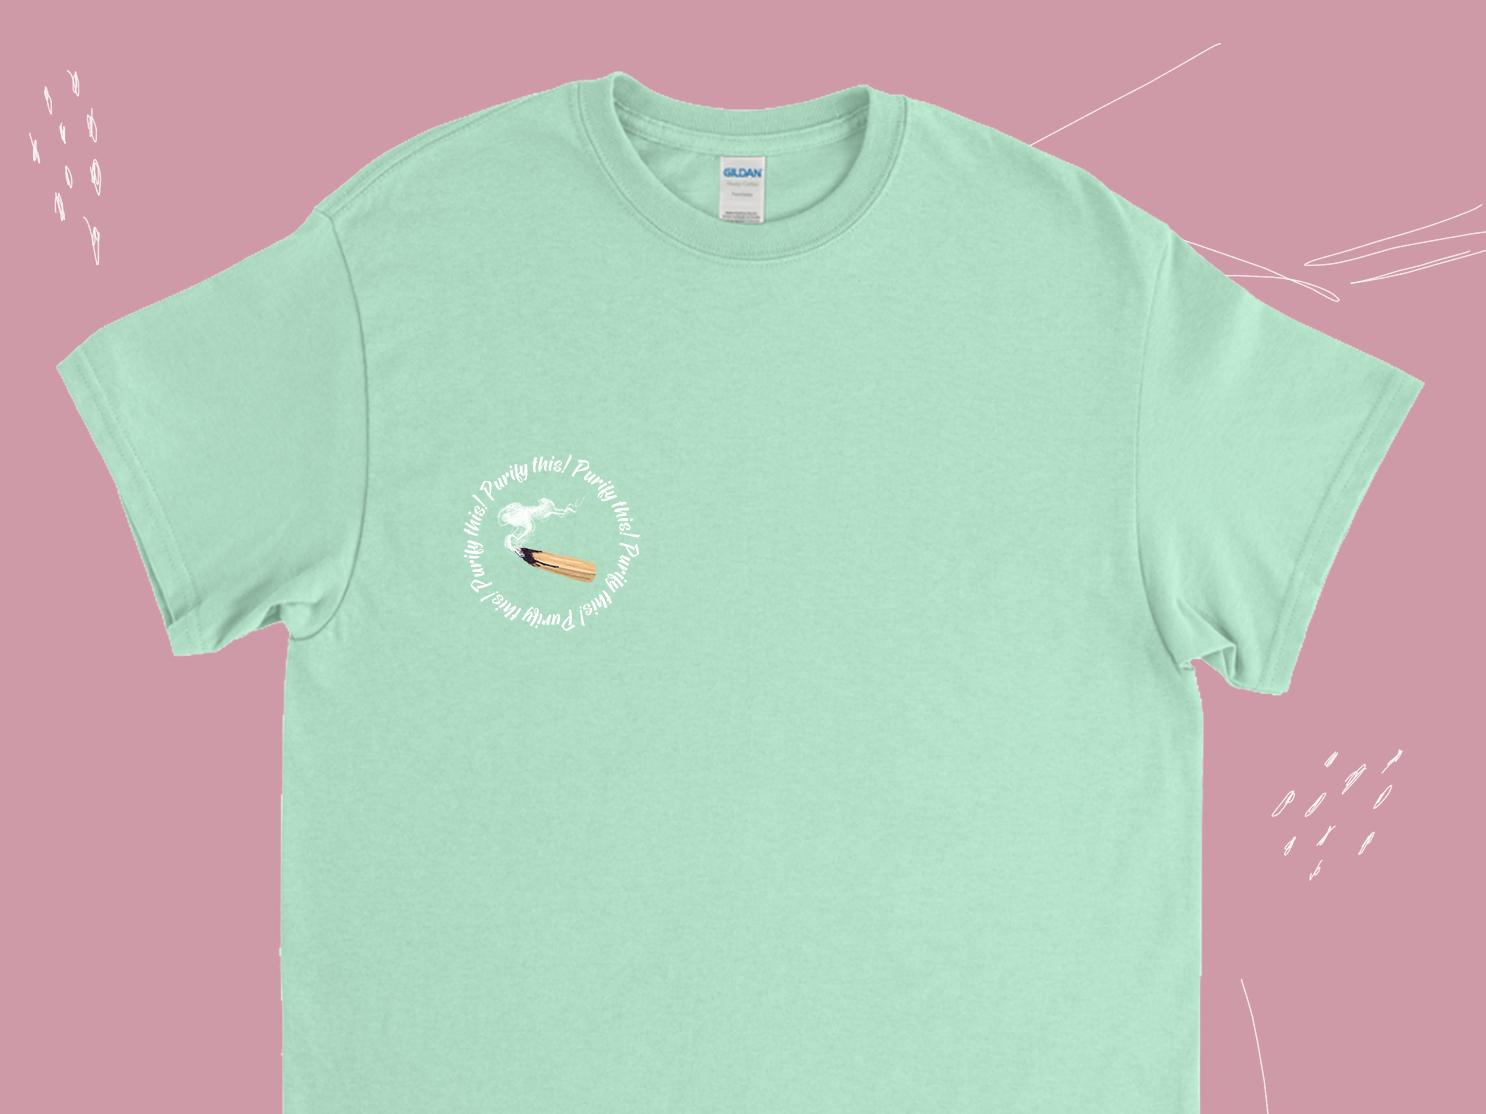 Palo Santo T-shirt smoke shop clothes cool illustration t-shirt graphic t-shirt design